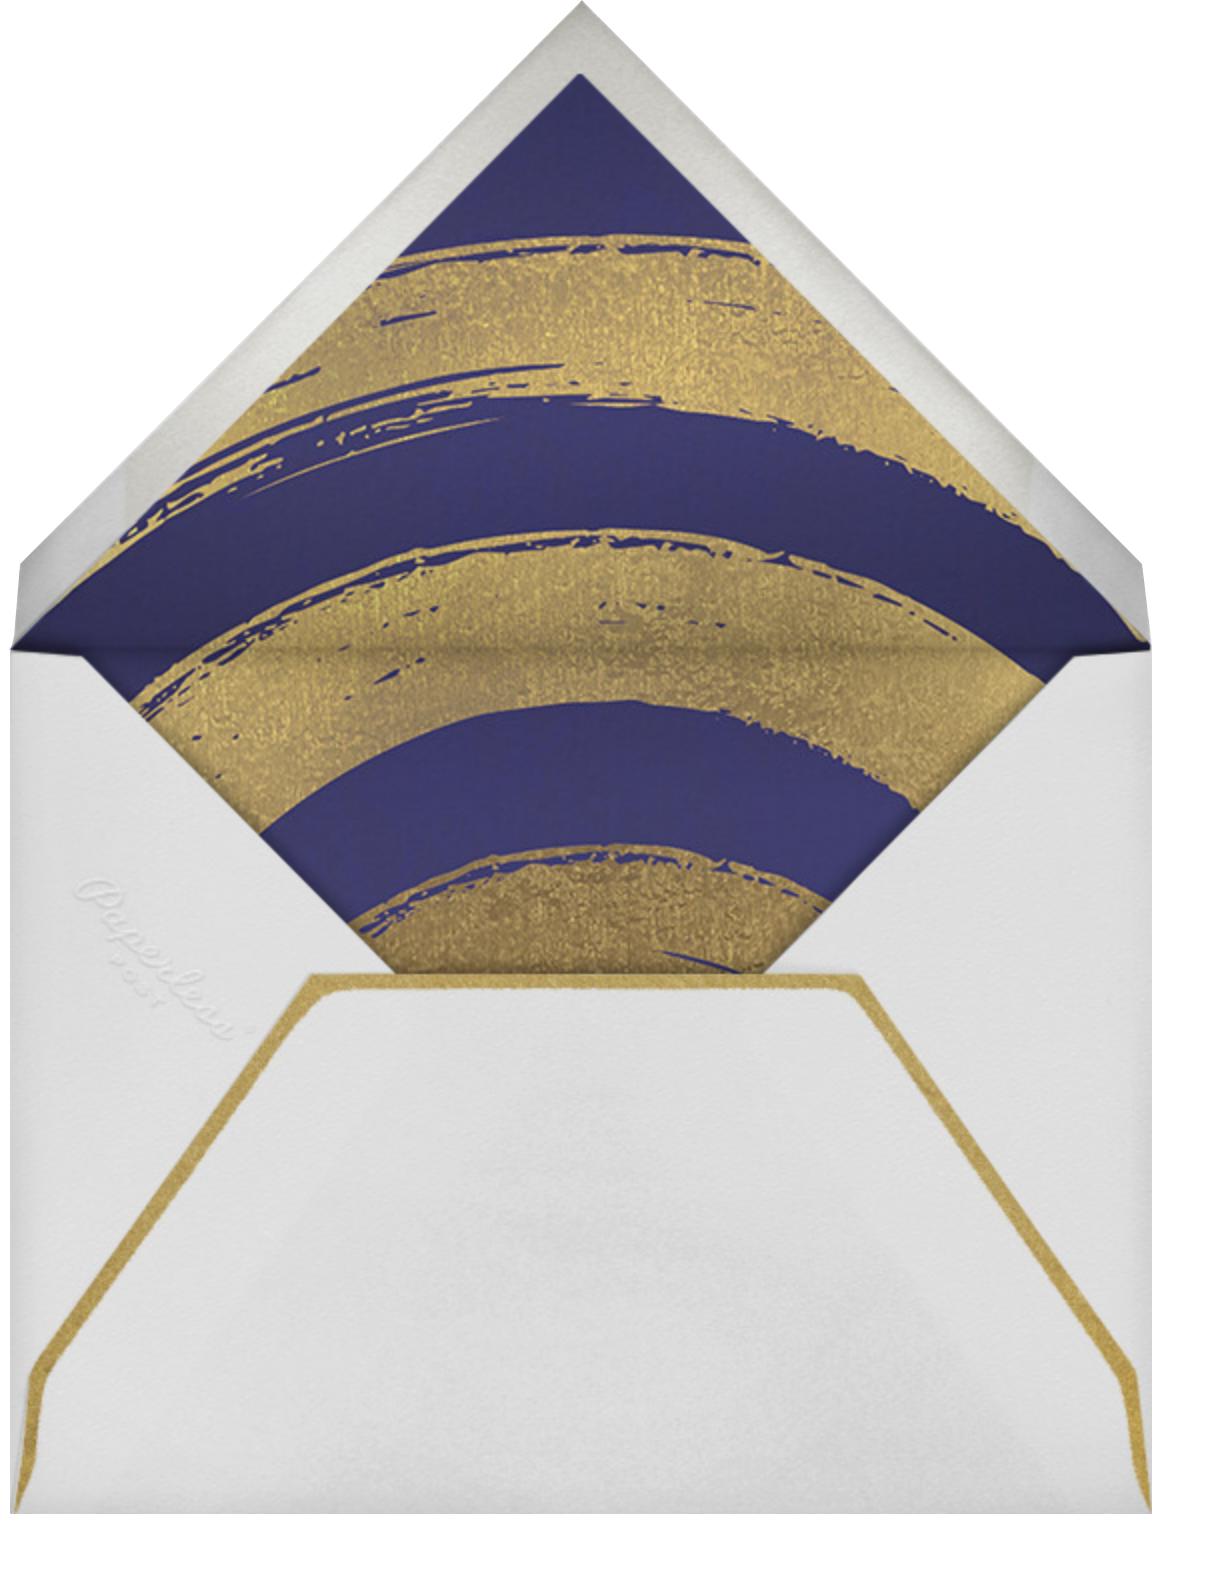 Gold Connection (Bat) - Paperless Post - Bat and bar mitzvah - envelope back